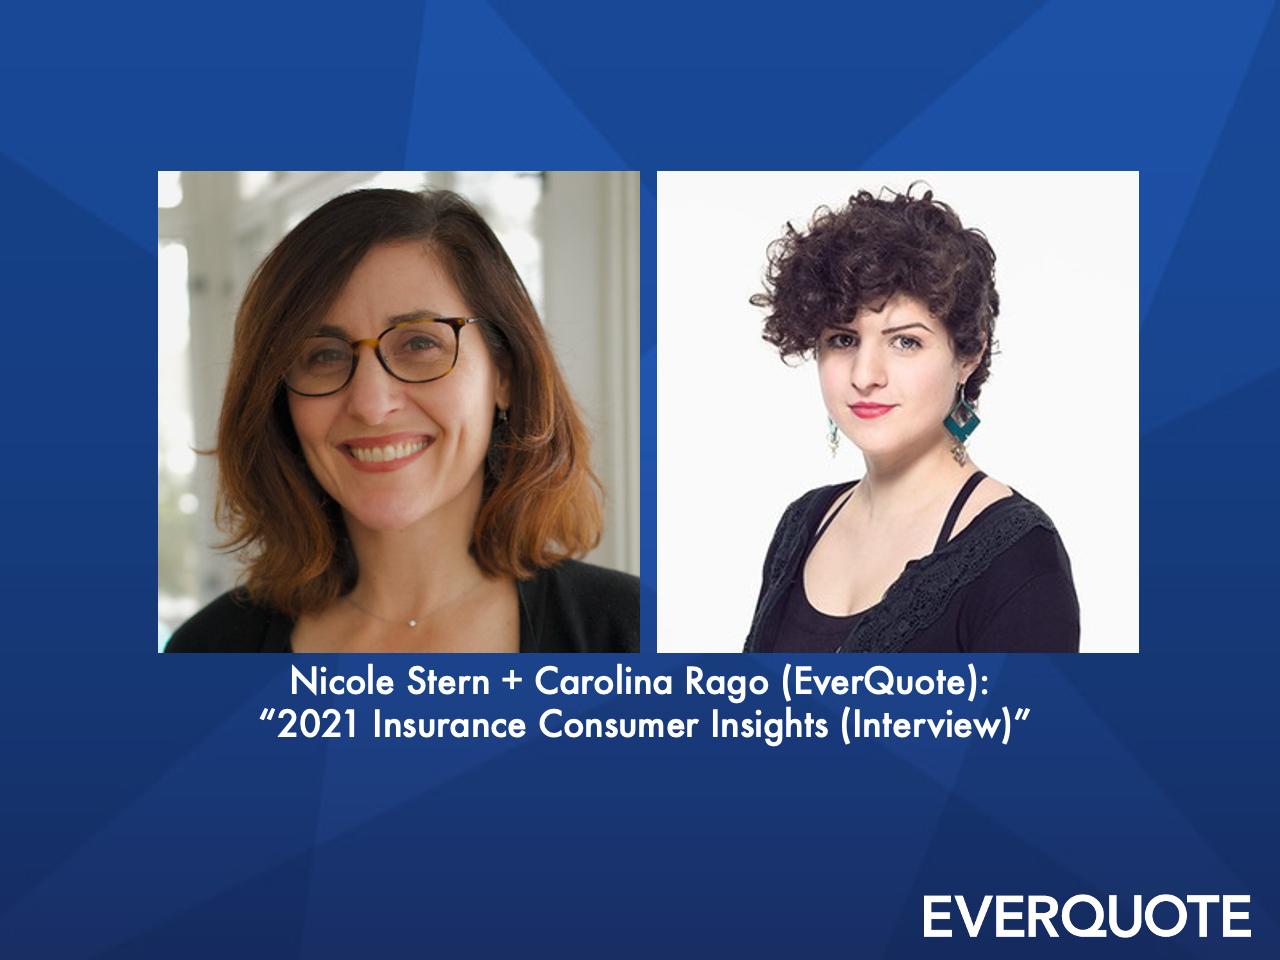 2021 Insurance Consumer Insights - Interview with Nicole Stern + Carolina Rago